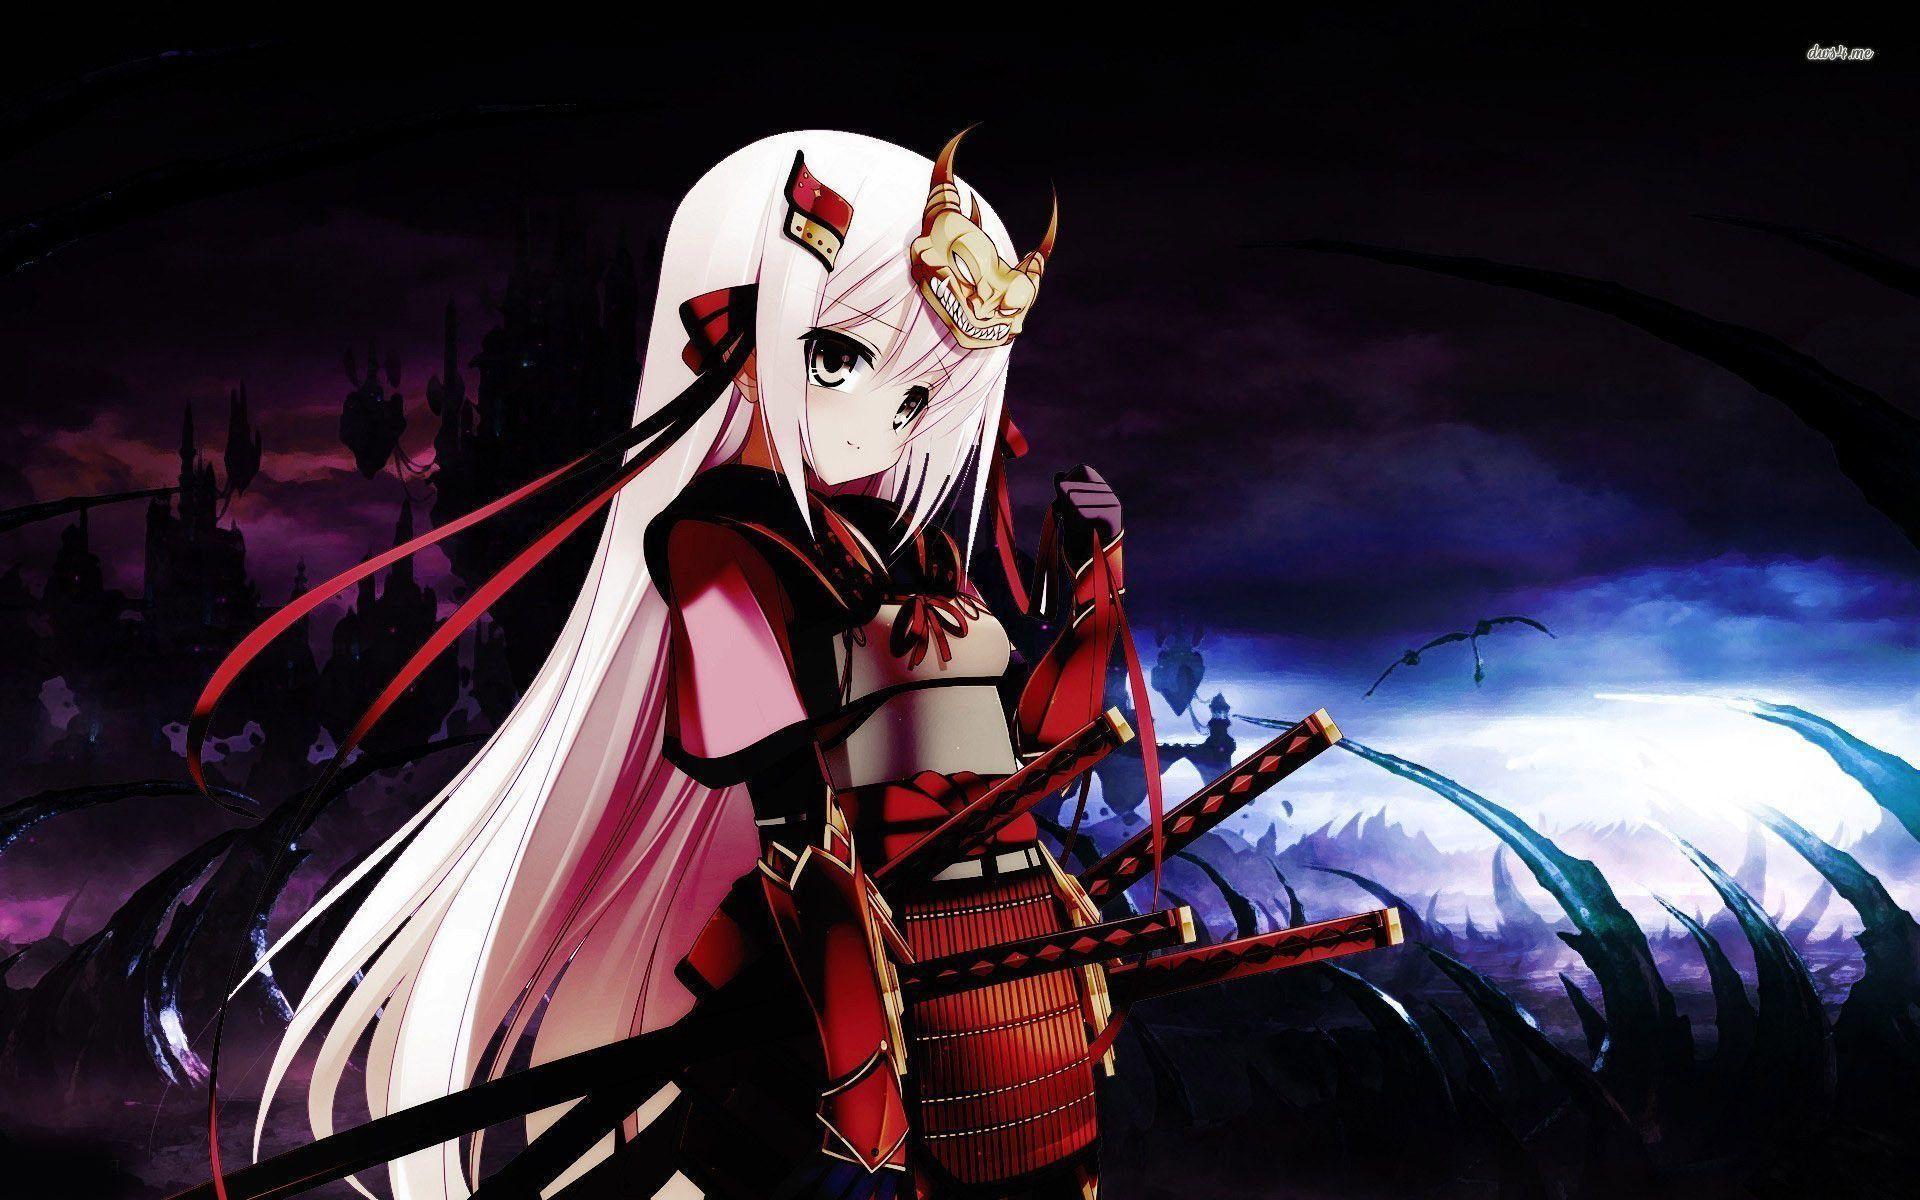 Anime Samurai Wallpapers - Wallpaper Cave